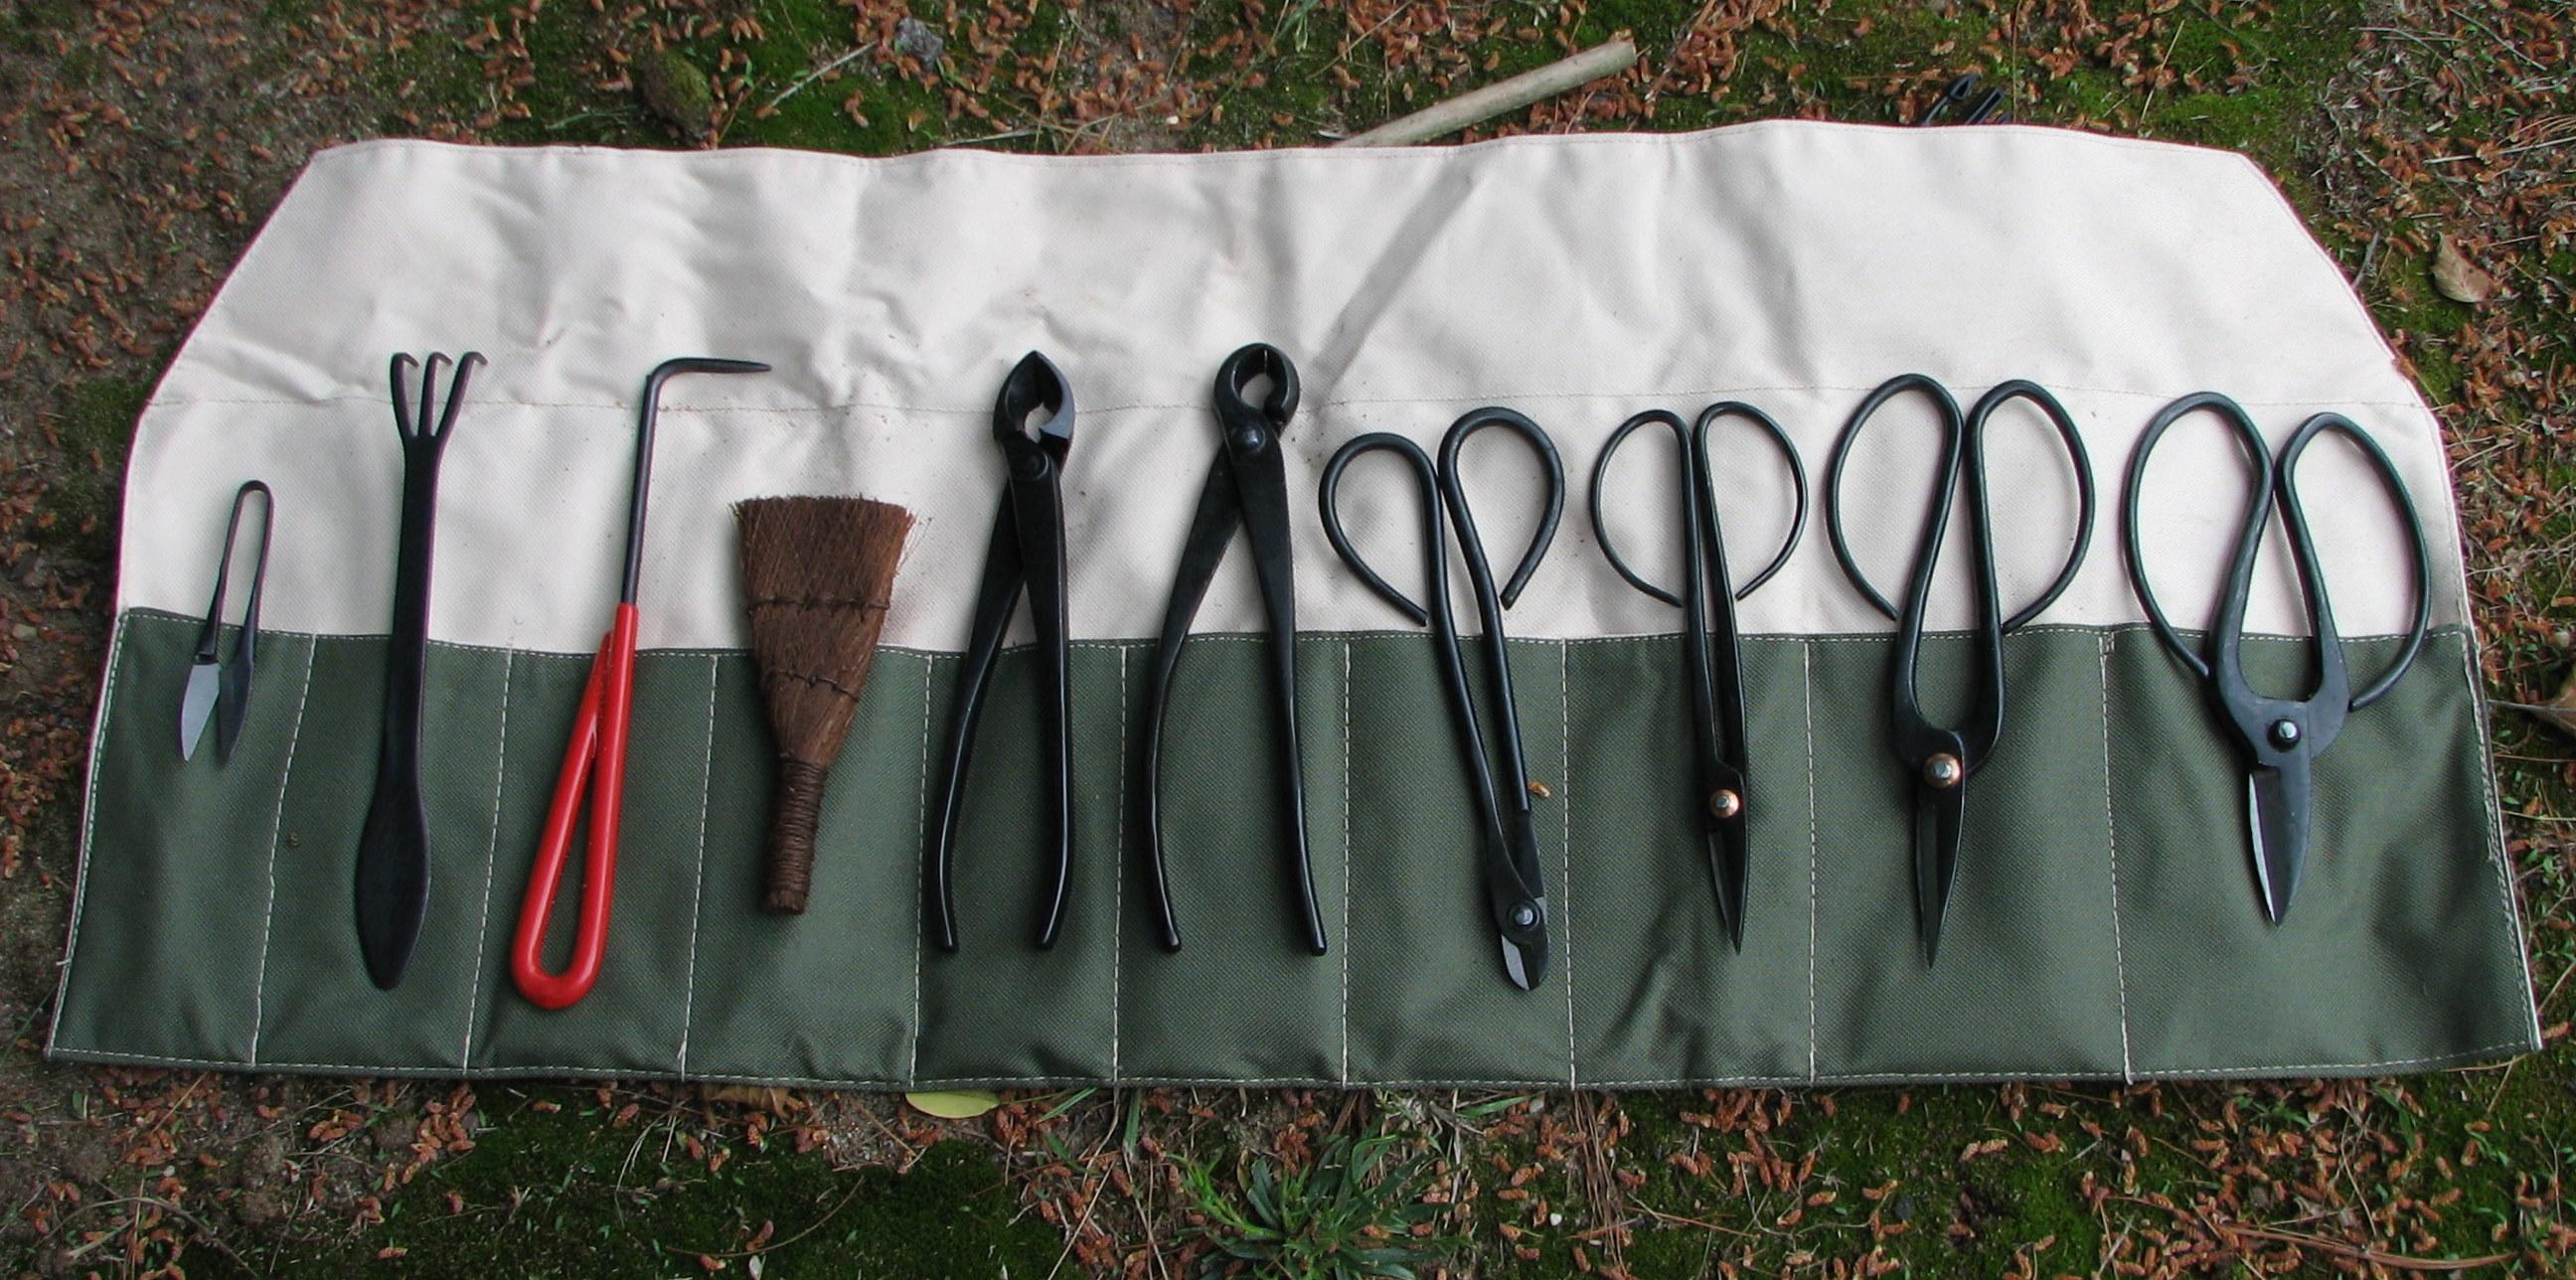 File:Bonsai tools.jpg - Wikimedia Commons